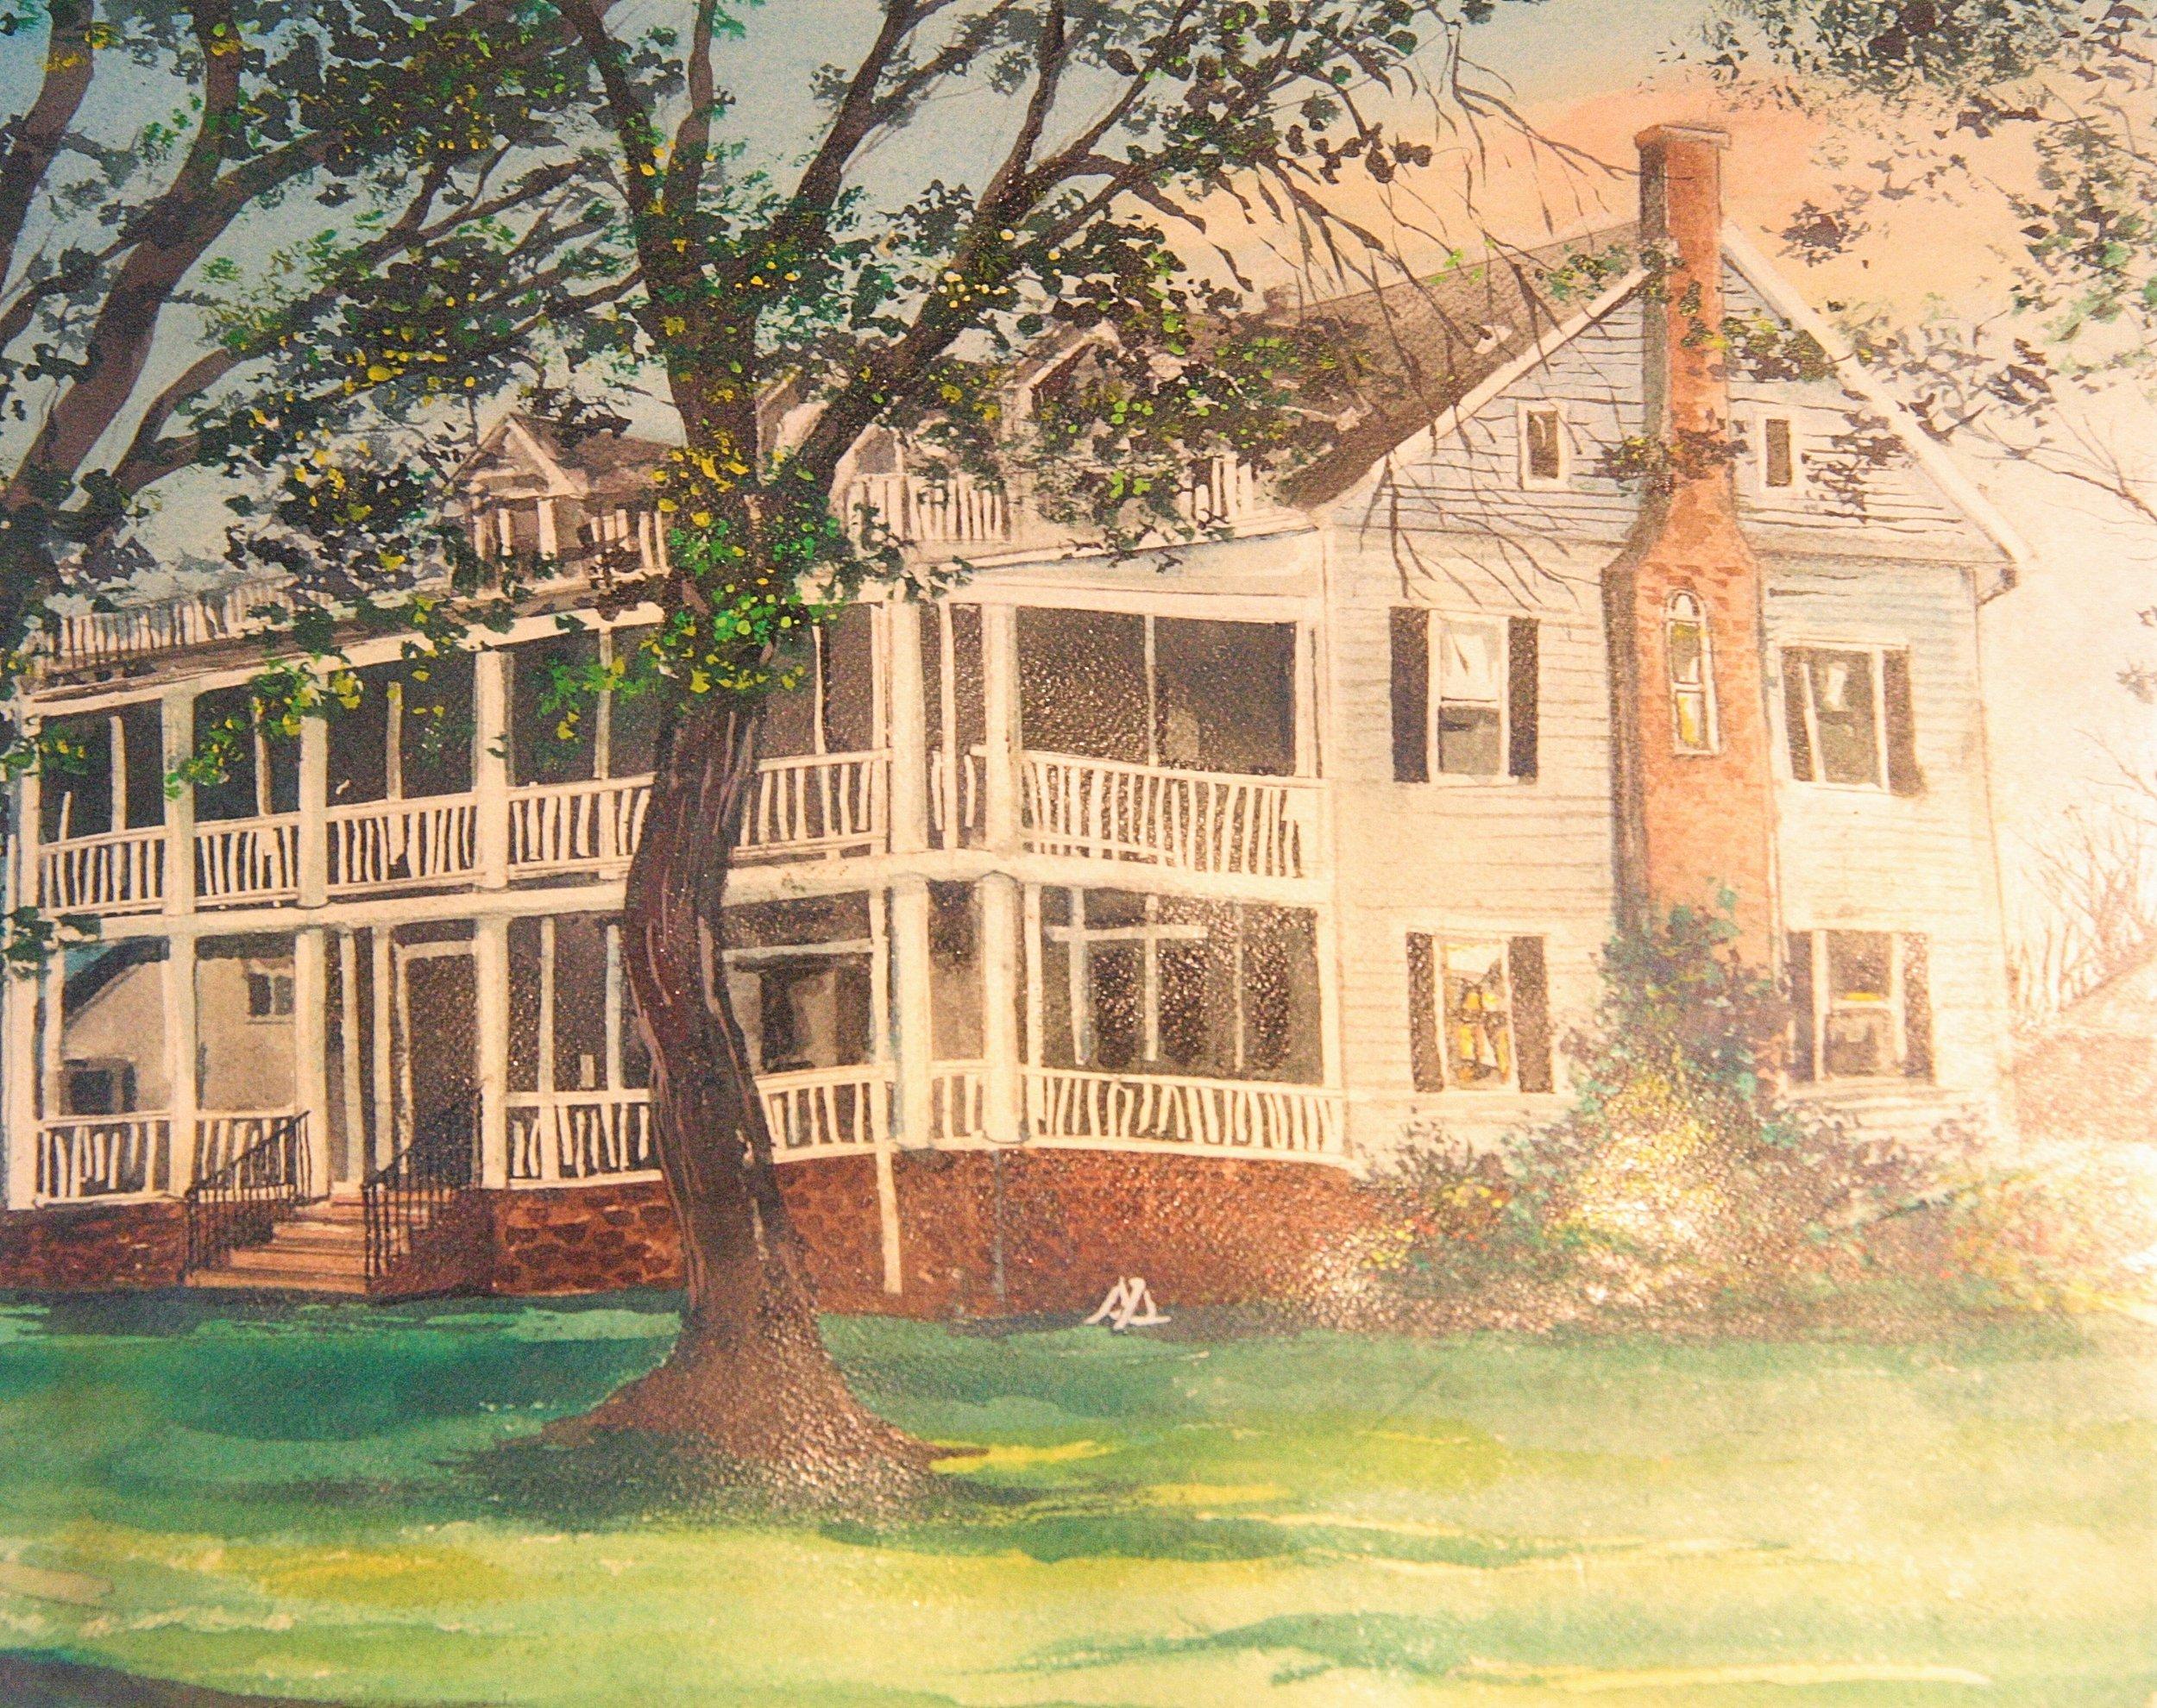 ismtam old hampton home closeup.jpg